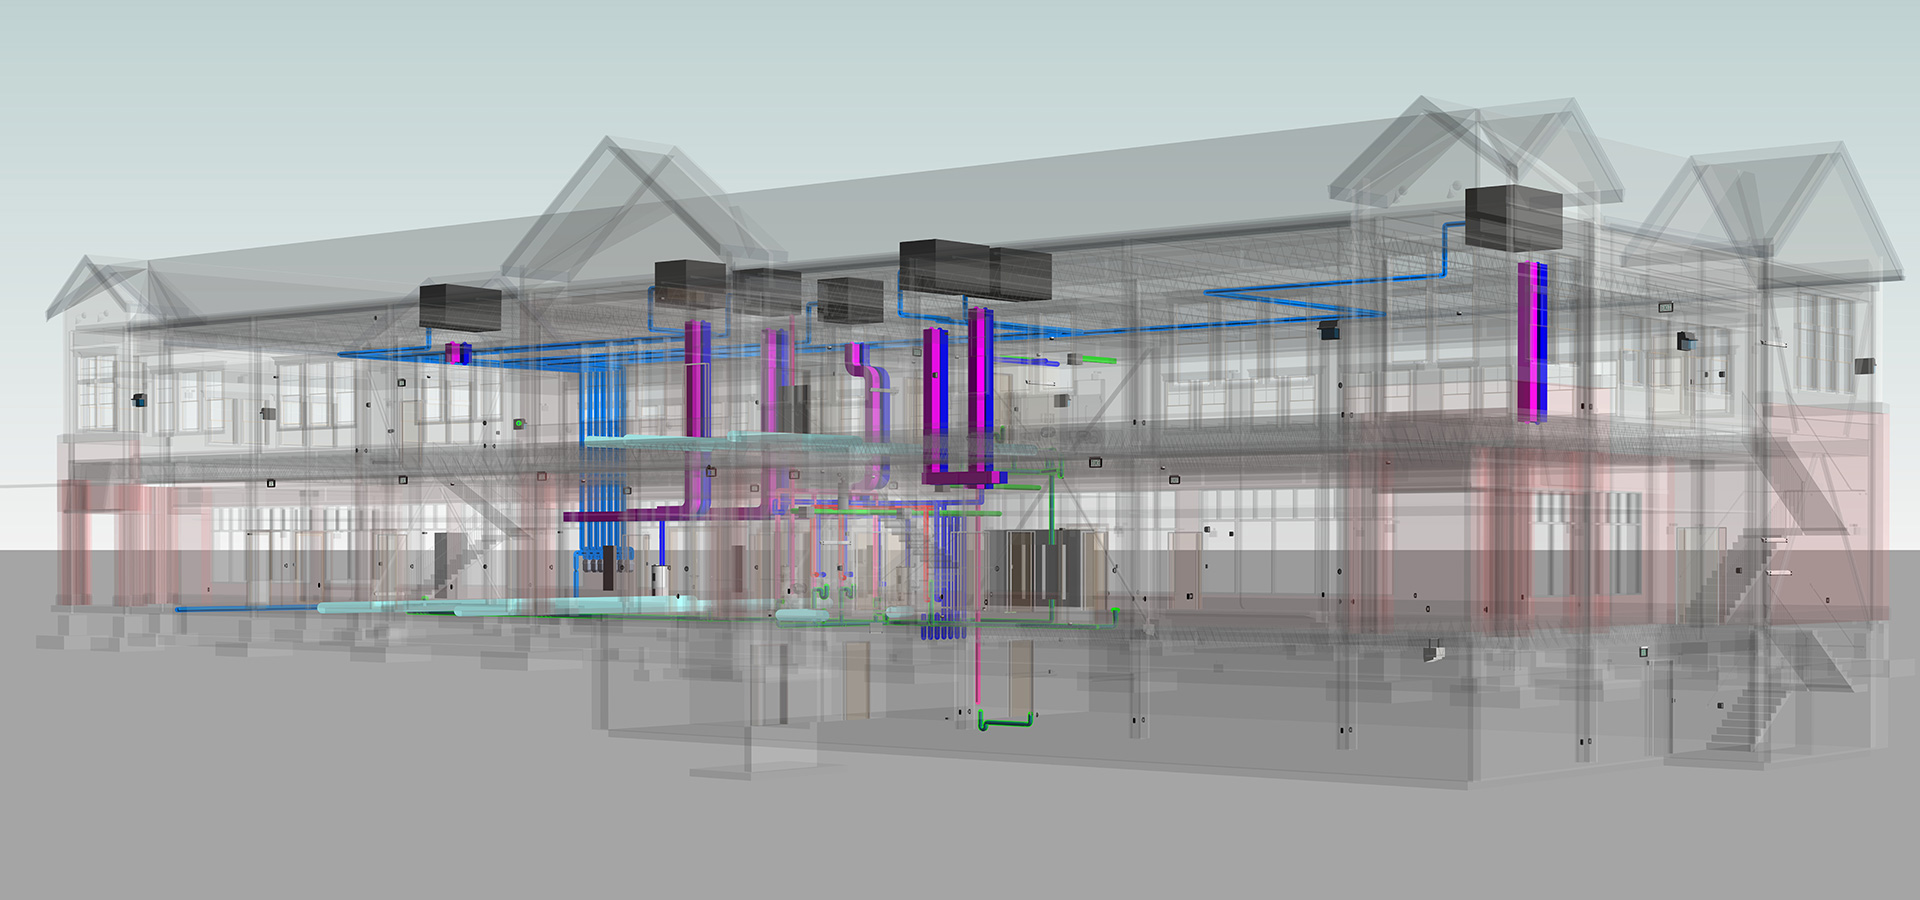 3D-Architecture-MEP-BIM-Model-Revit-Modeling-by-United-BIM